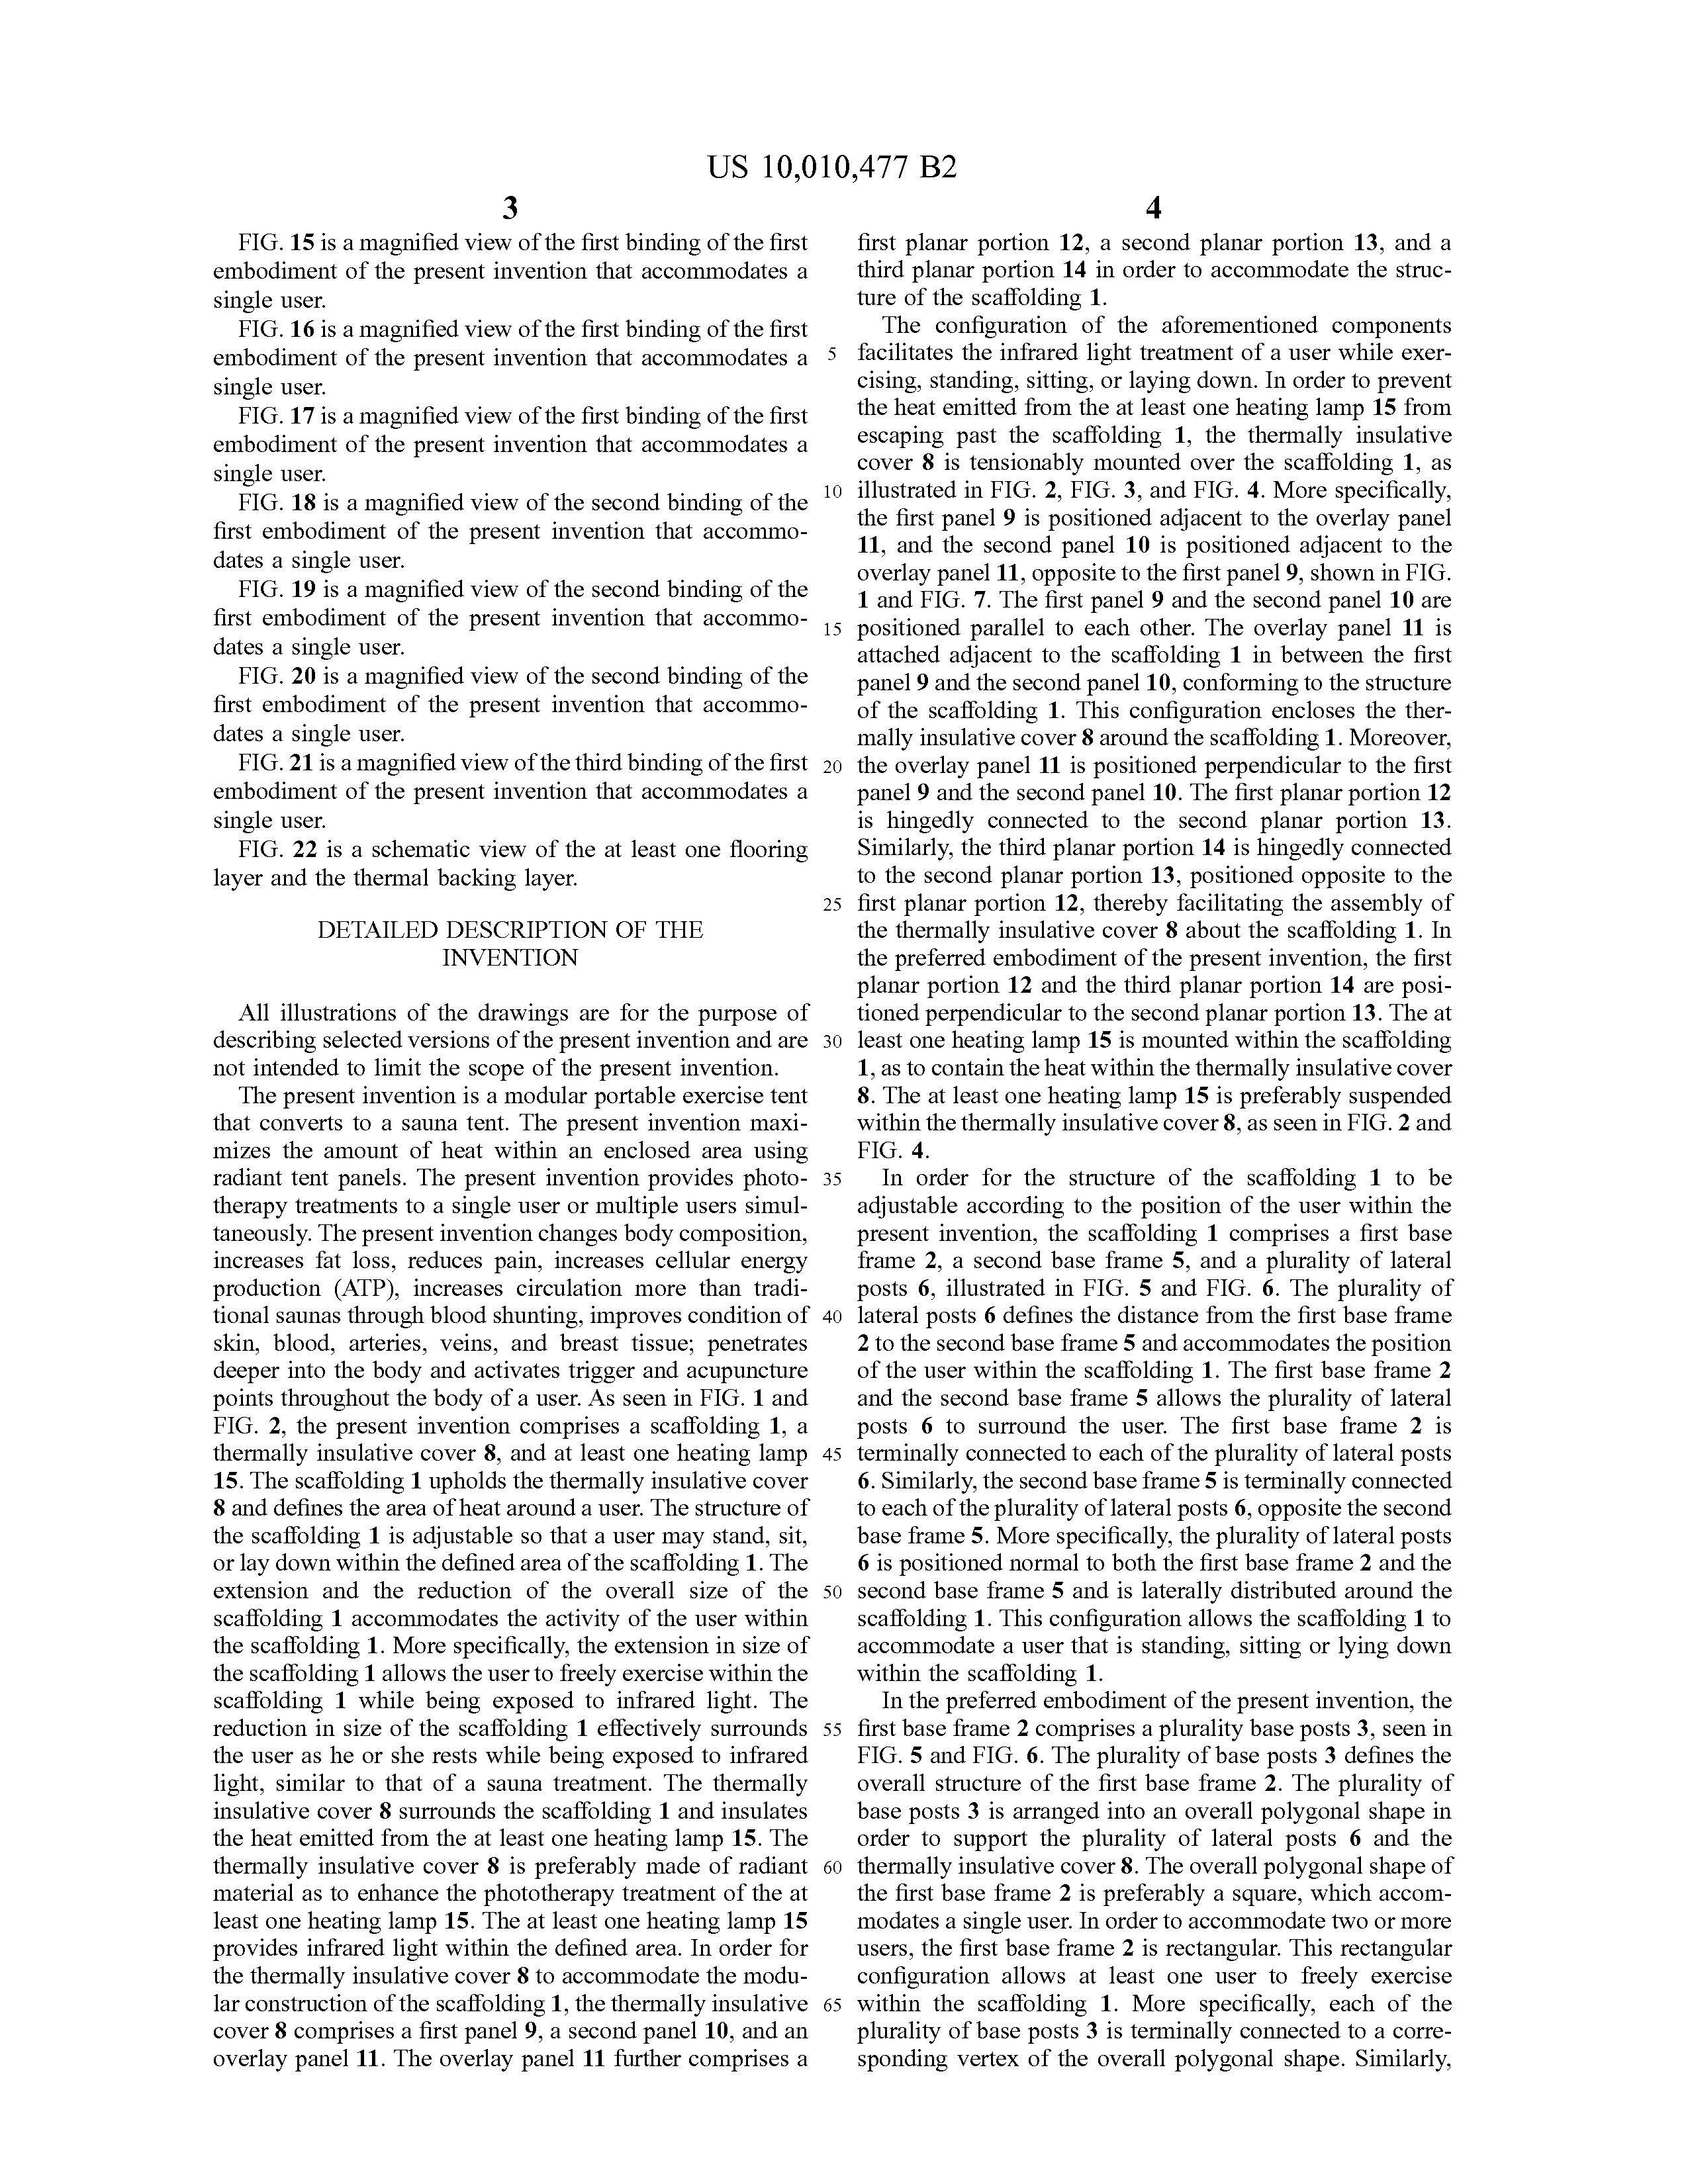 Sauna Tent Patent Page 26